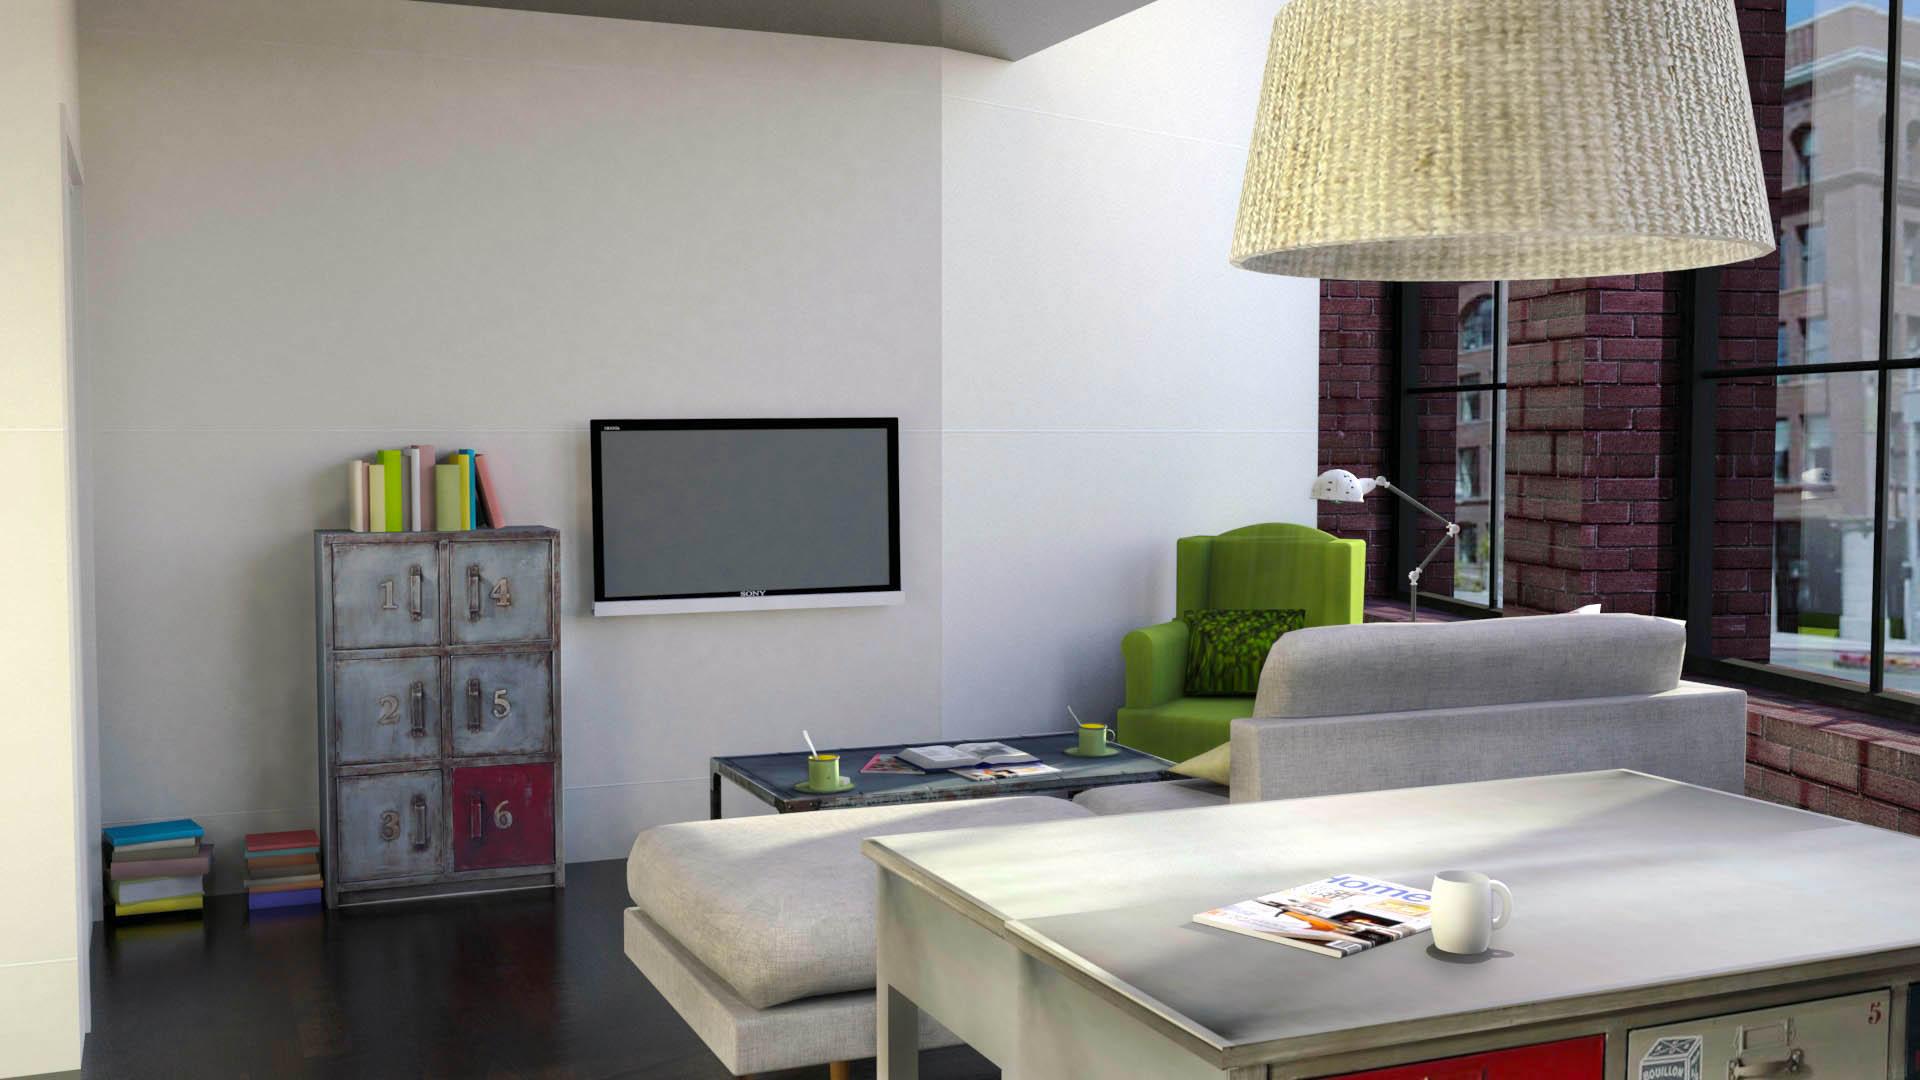 living room final draft post.jpg